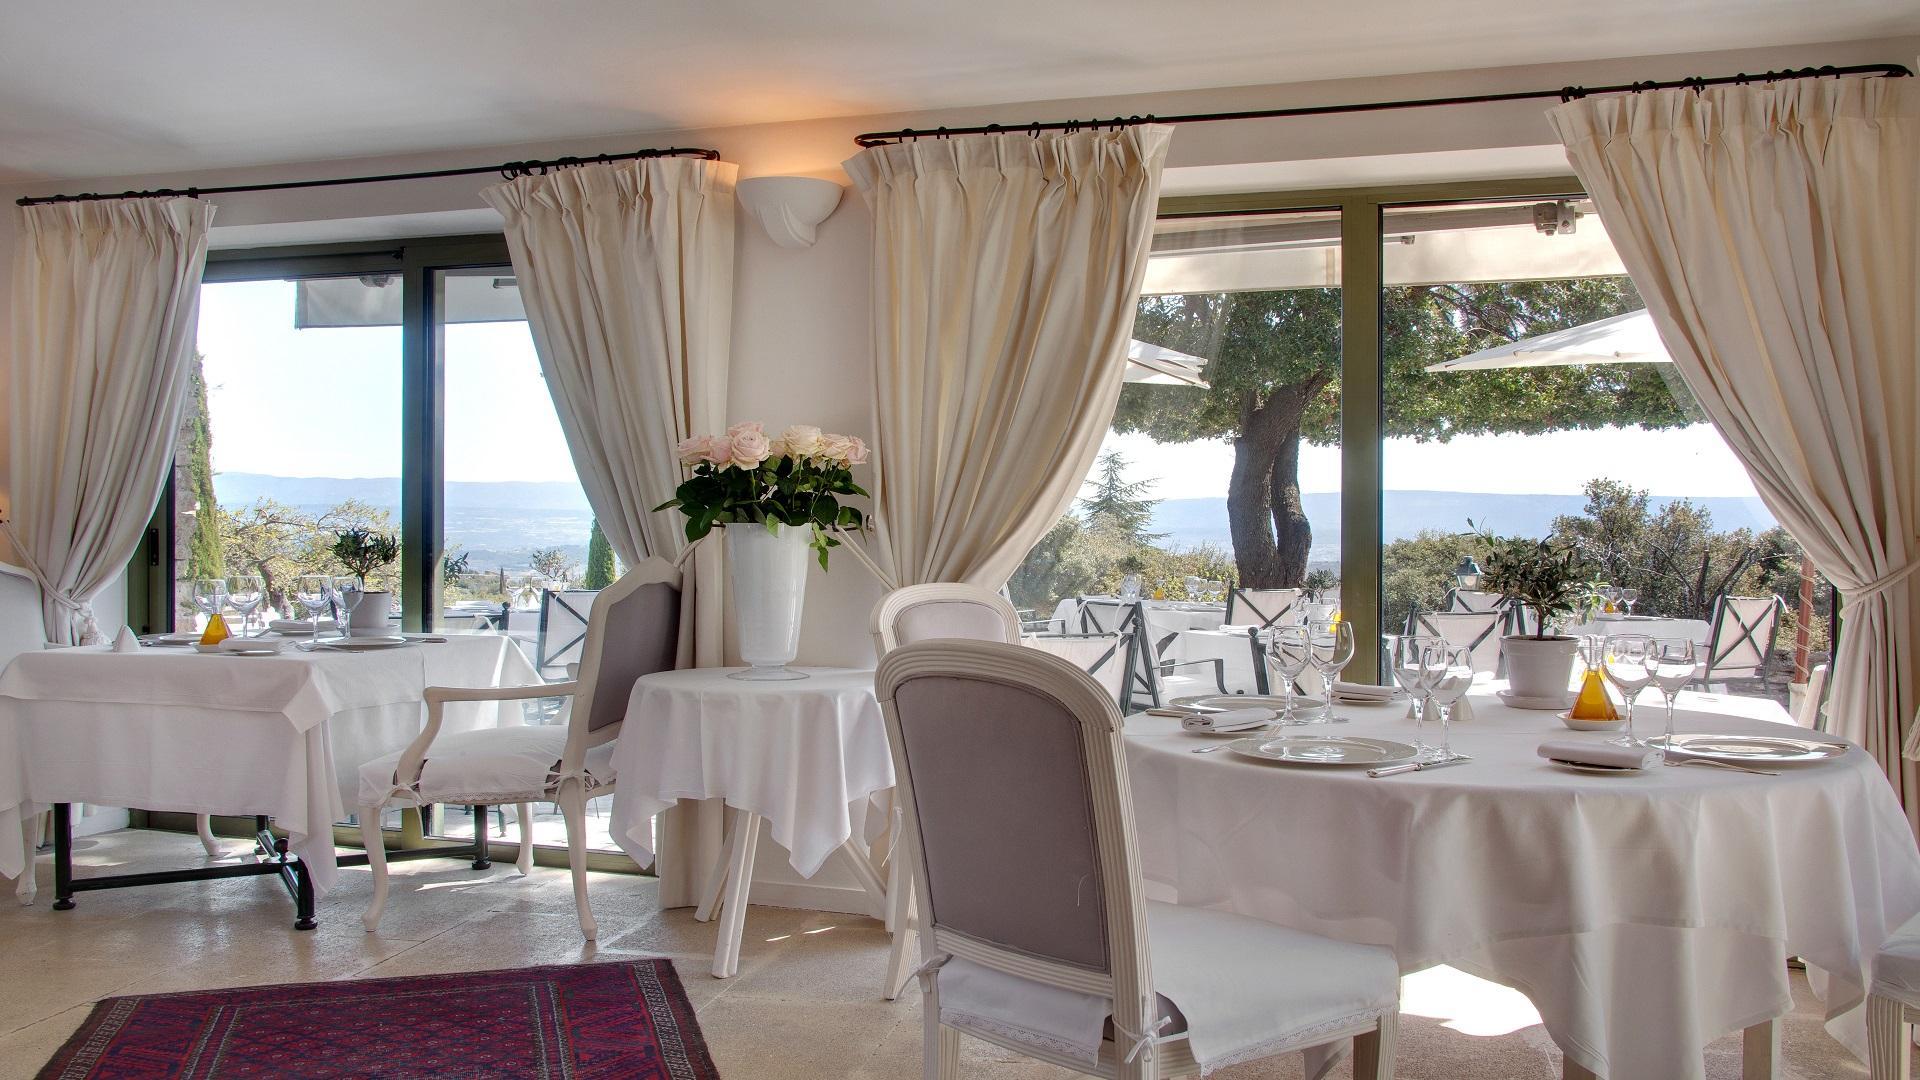 les-bories-spa-provence-luberon-avignon-restaurant-seminaires-de-caractere